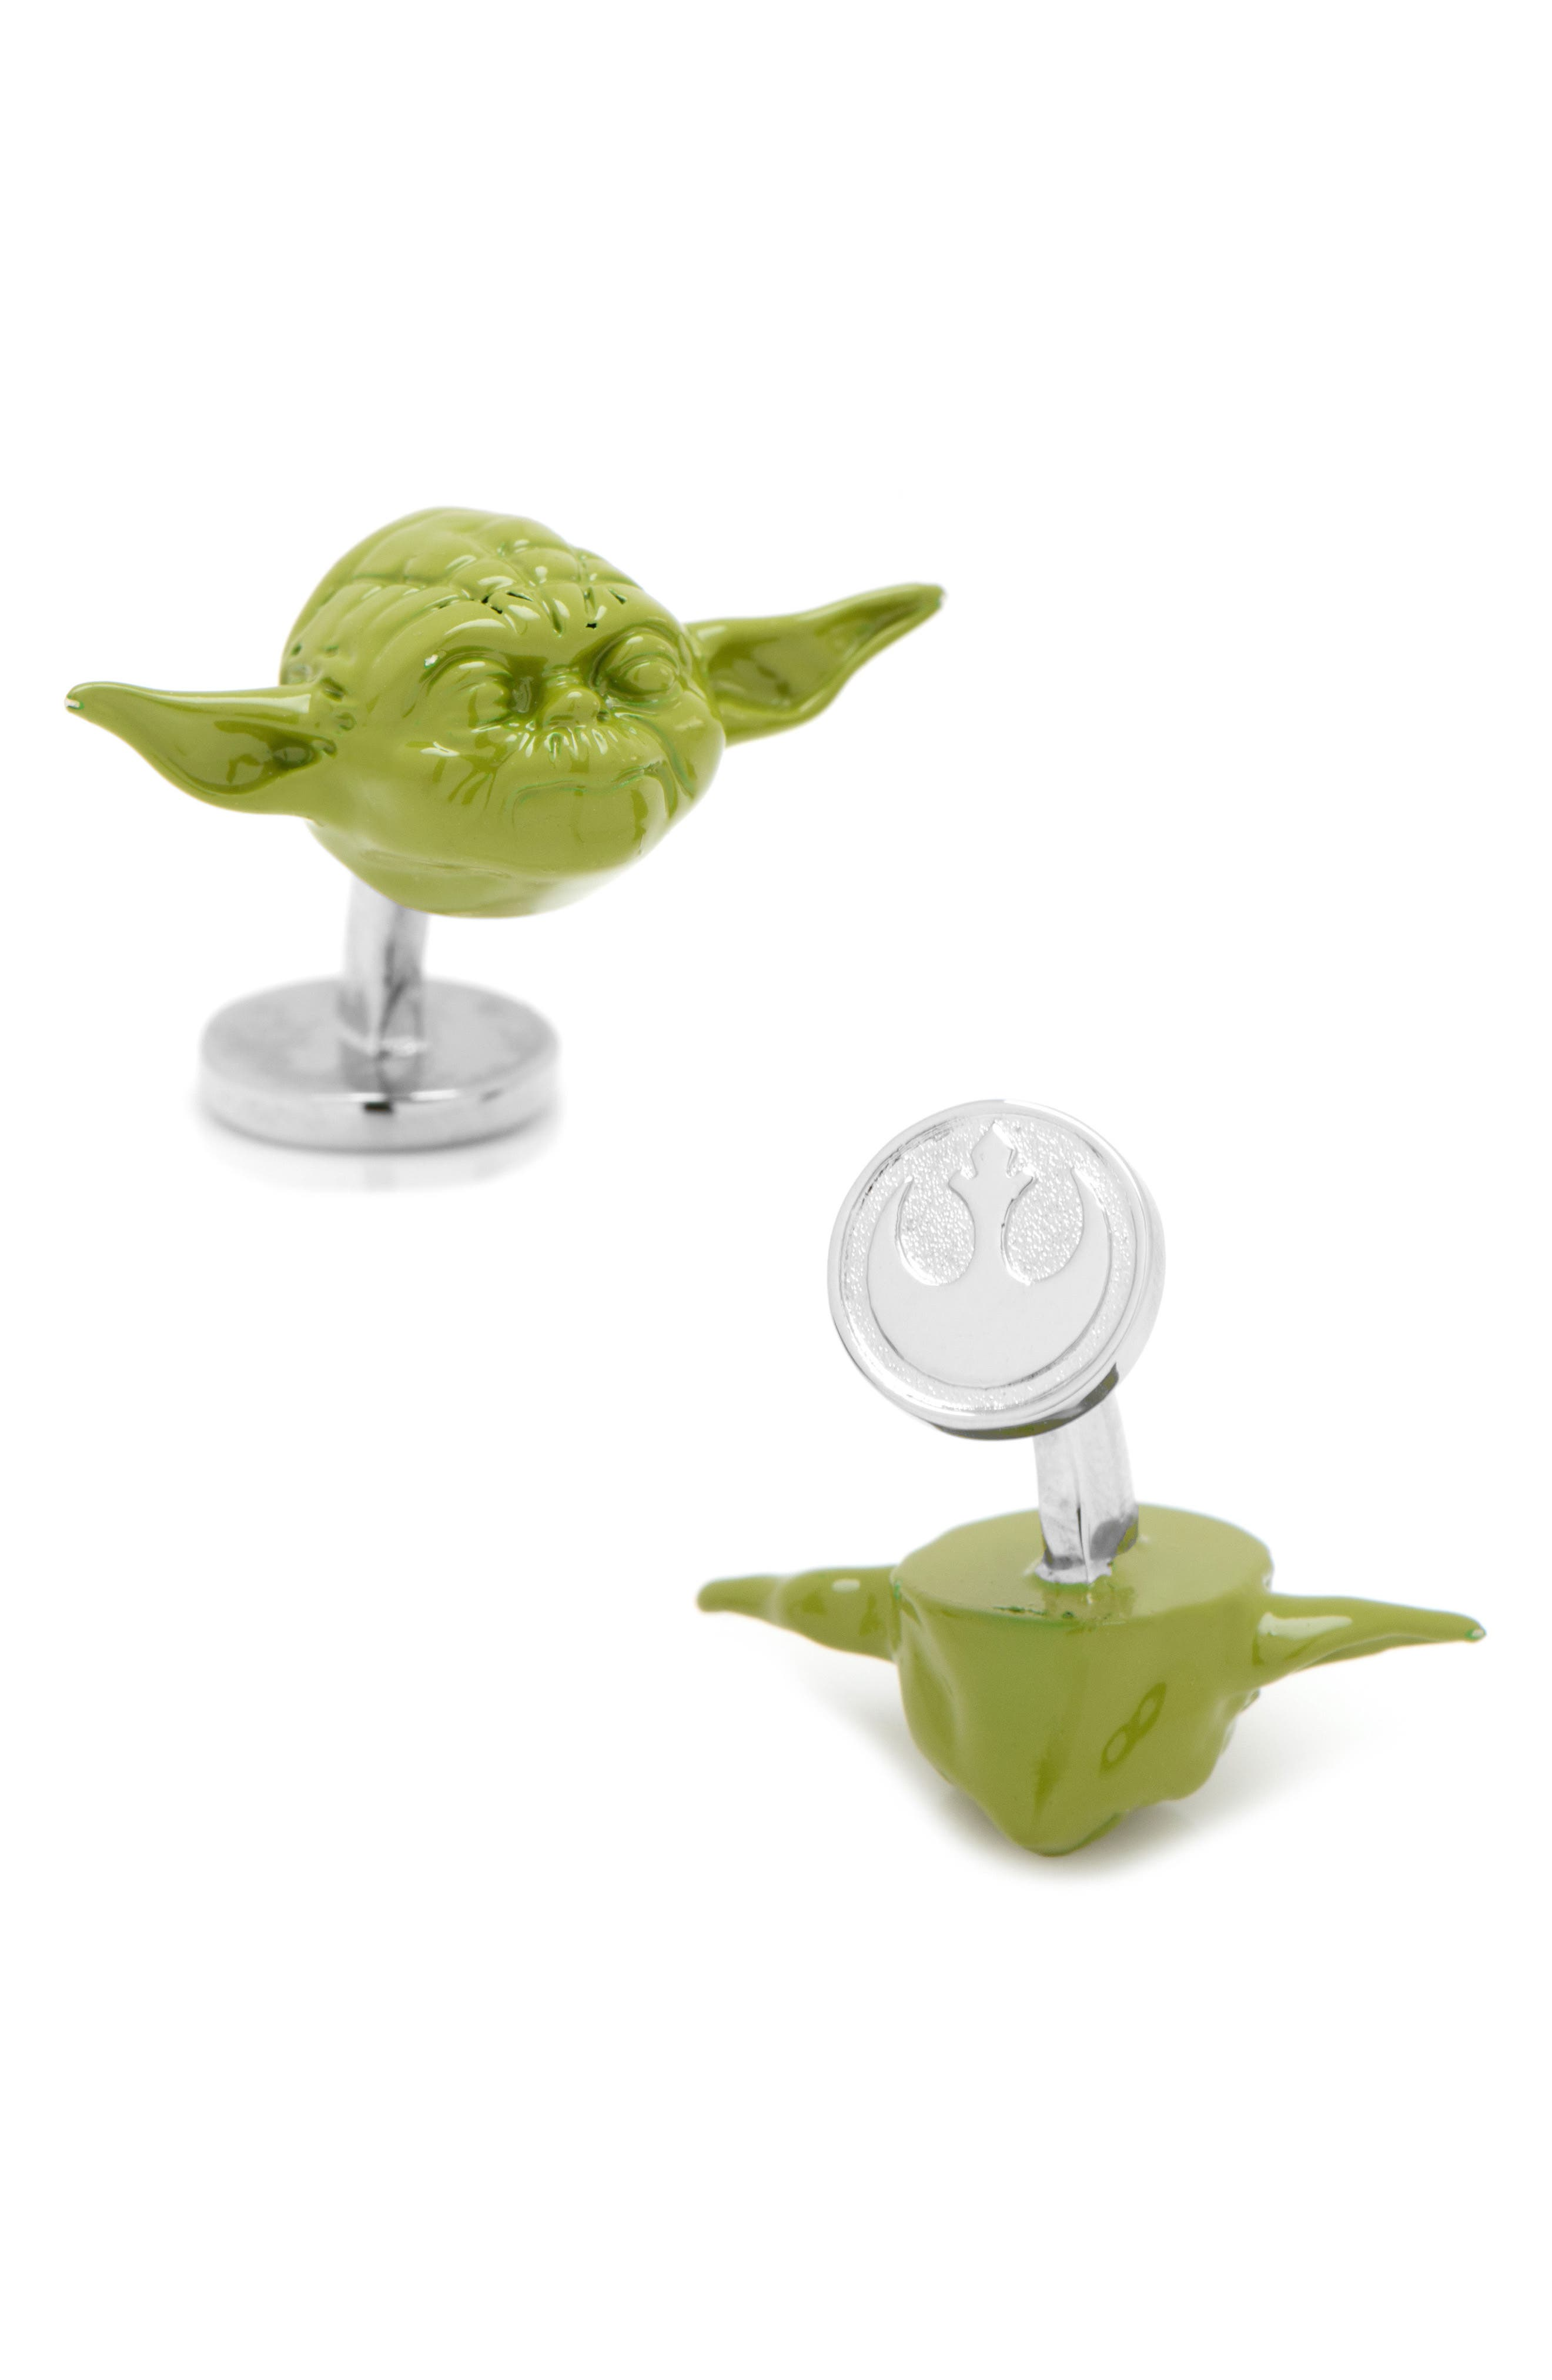 Star Wars<sup>™</sup> Yoda 3D Cuff Links,                             Main thumbnail 1, color,                             300